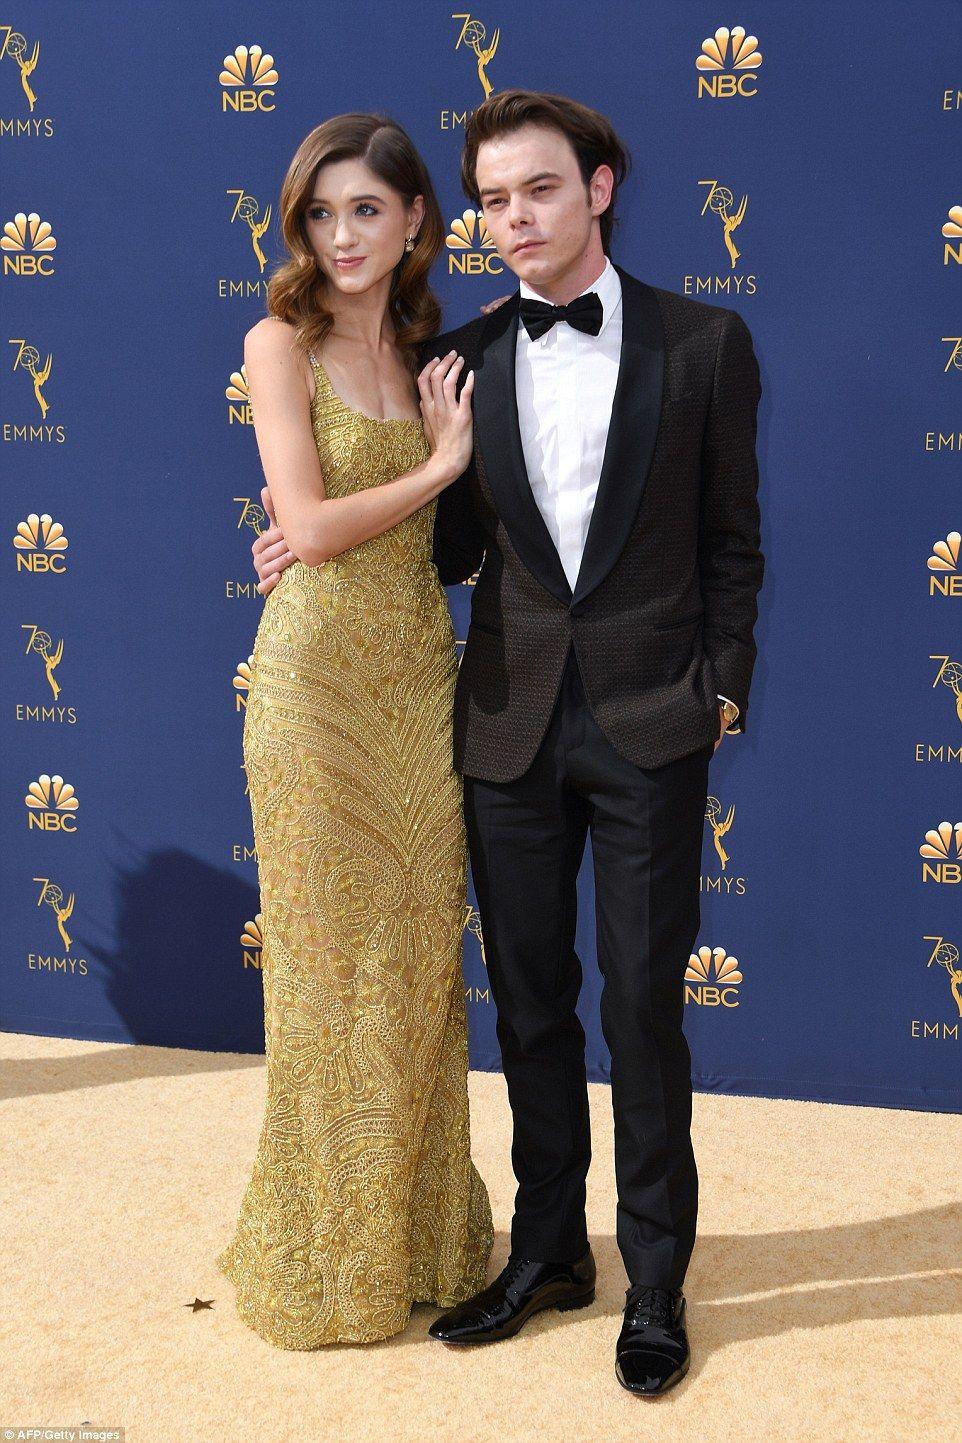 Emmy awards best dressed stars hit the red carpet natalie